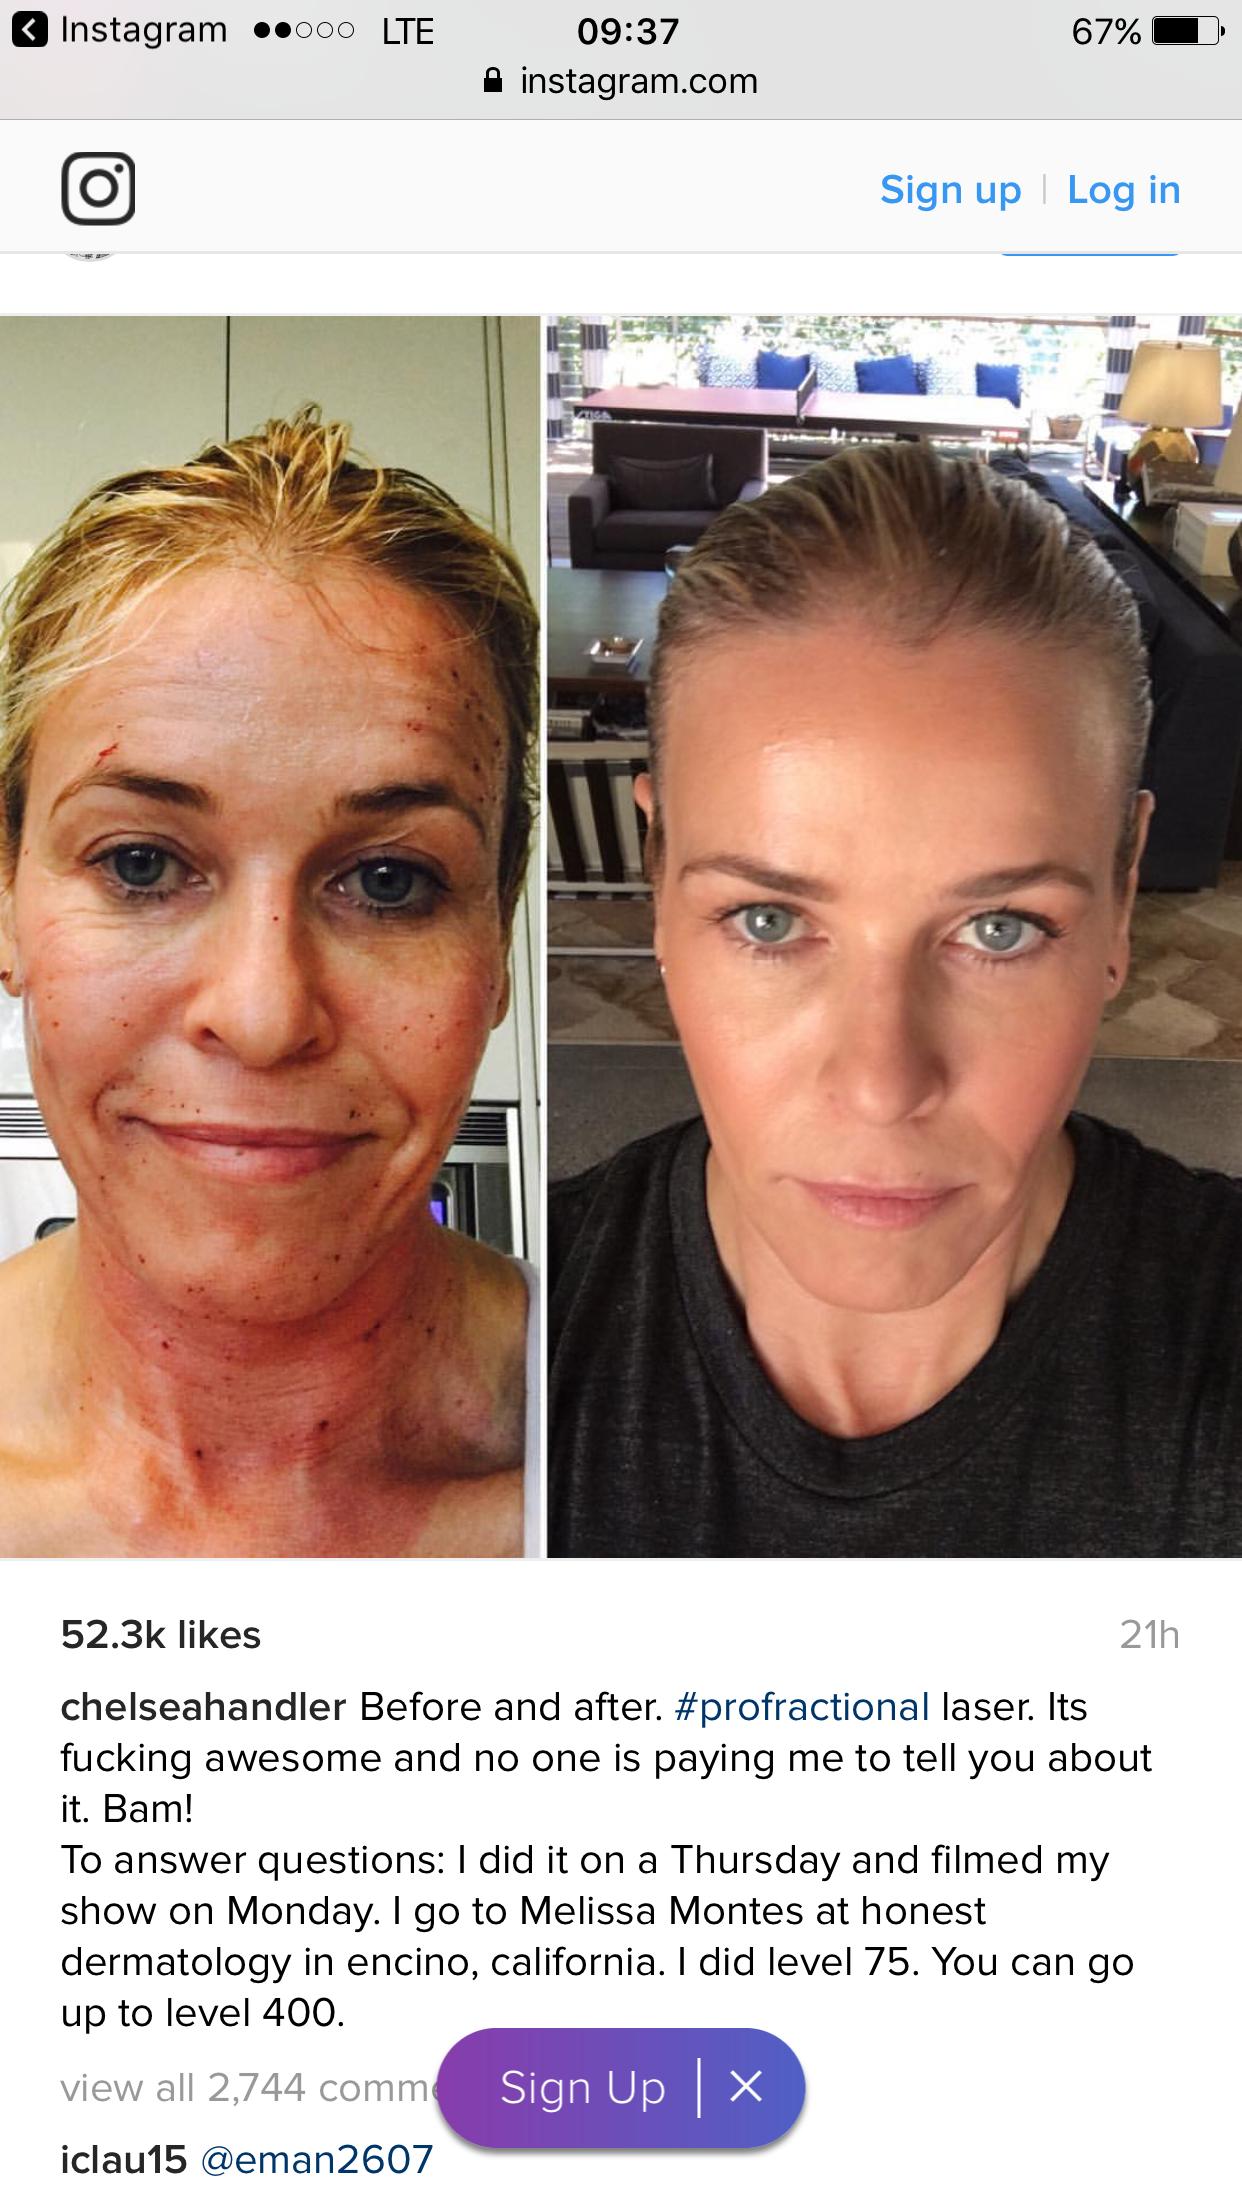 Profractional laser! Laser skin treatment